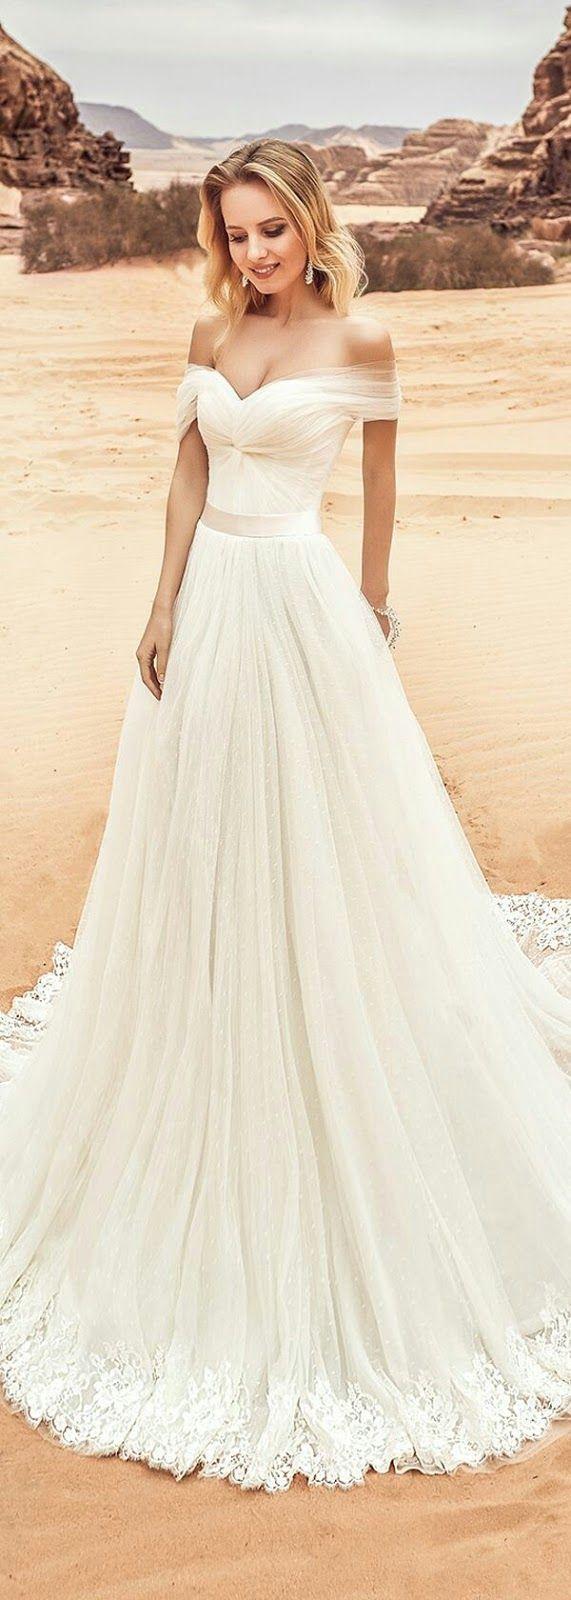 White wedding dress vestidos de novia pinterest white wedding